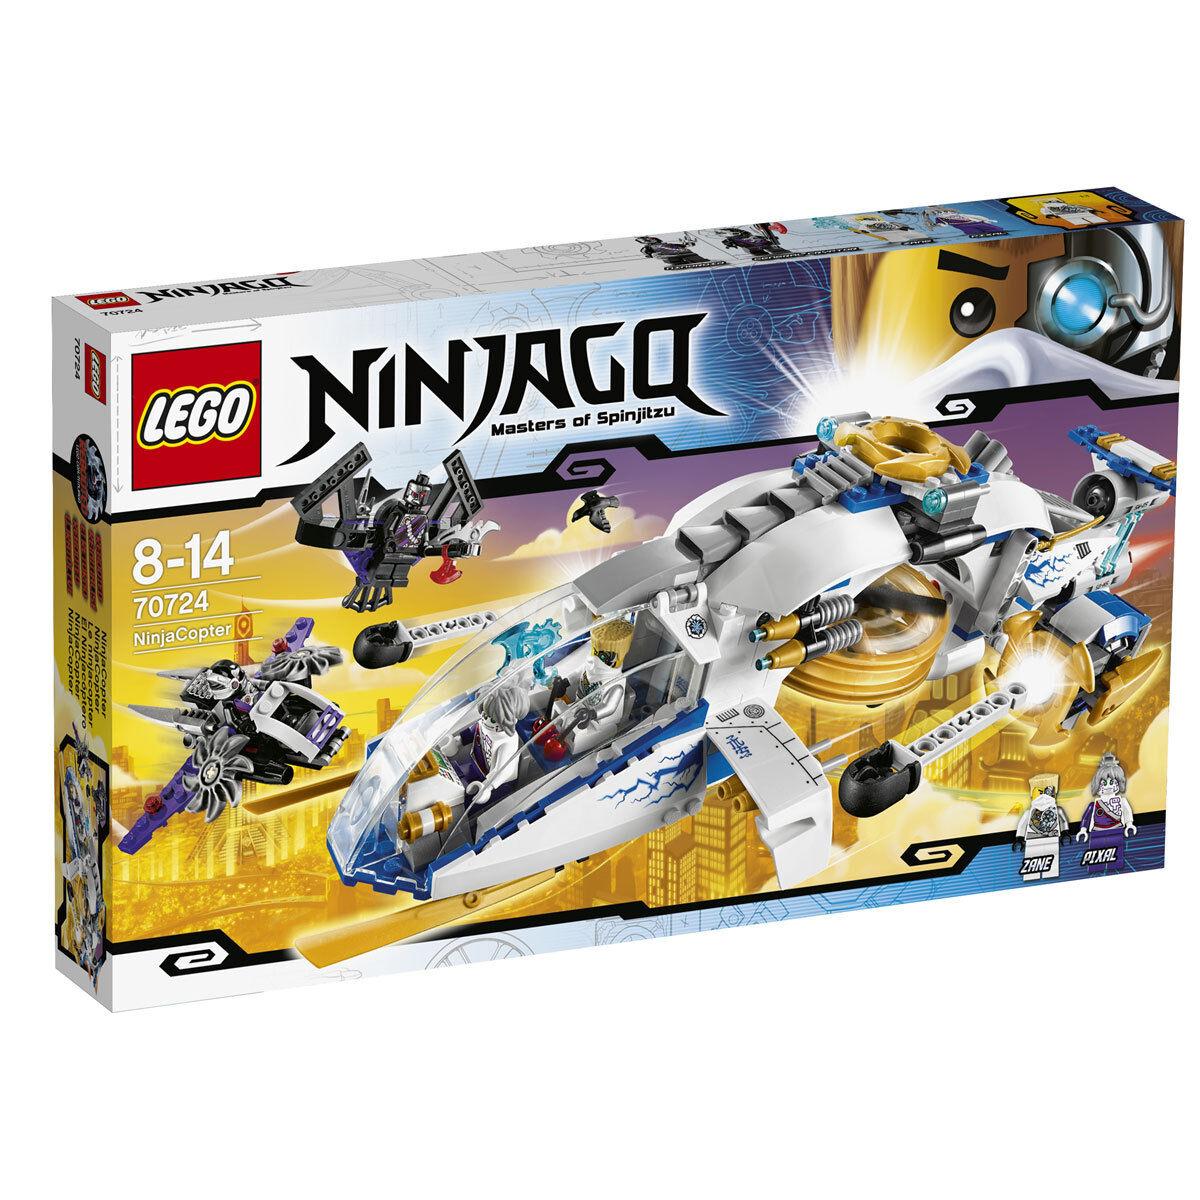 LEGO Ninjago NinjaCopter  70724 incl. Battle-scarROT Zane & Pixal - NLA & RARE